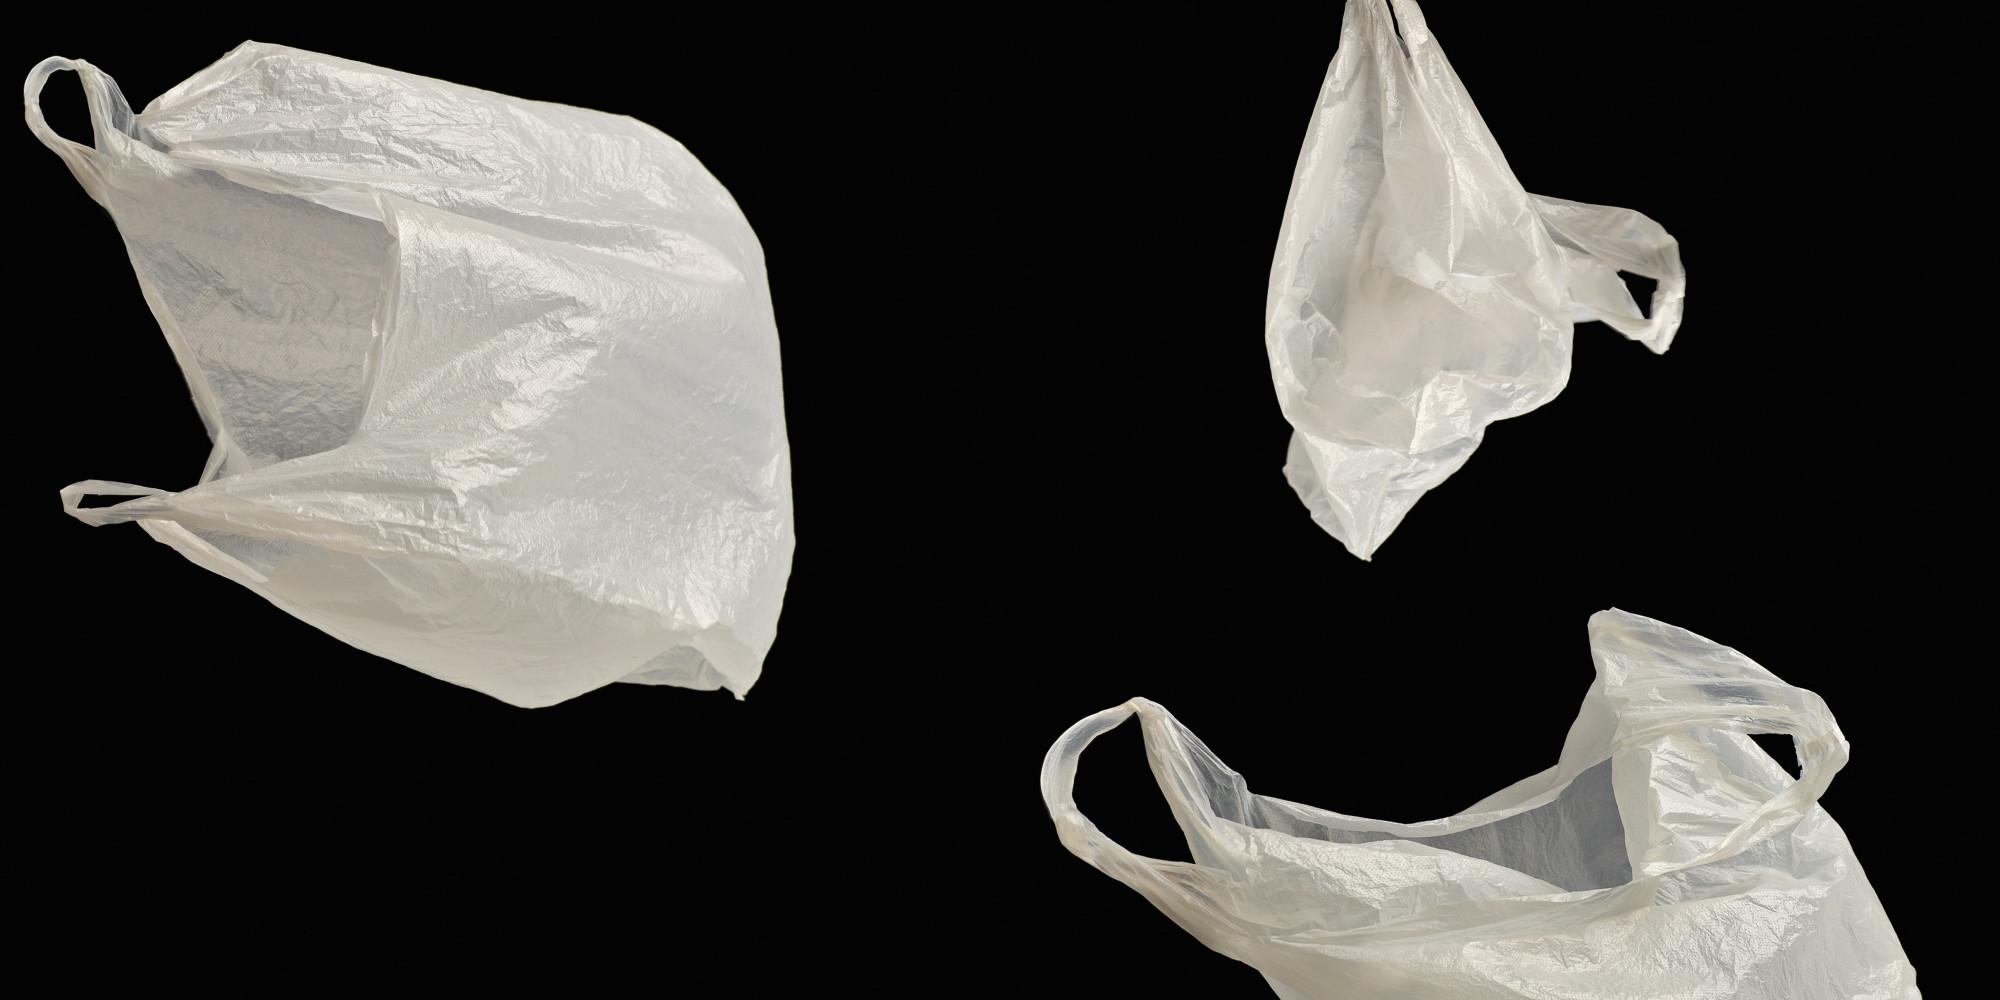 Hawaii county set to begin plastic bag ban for Plastic t shirt bag